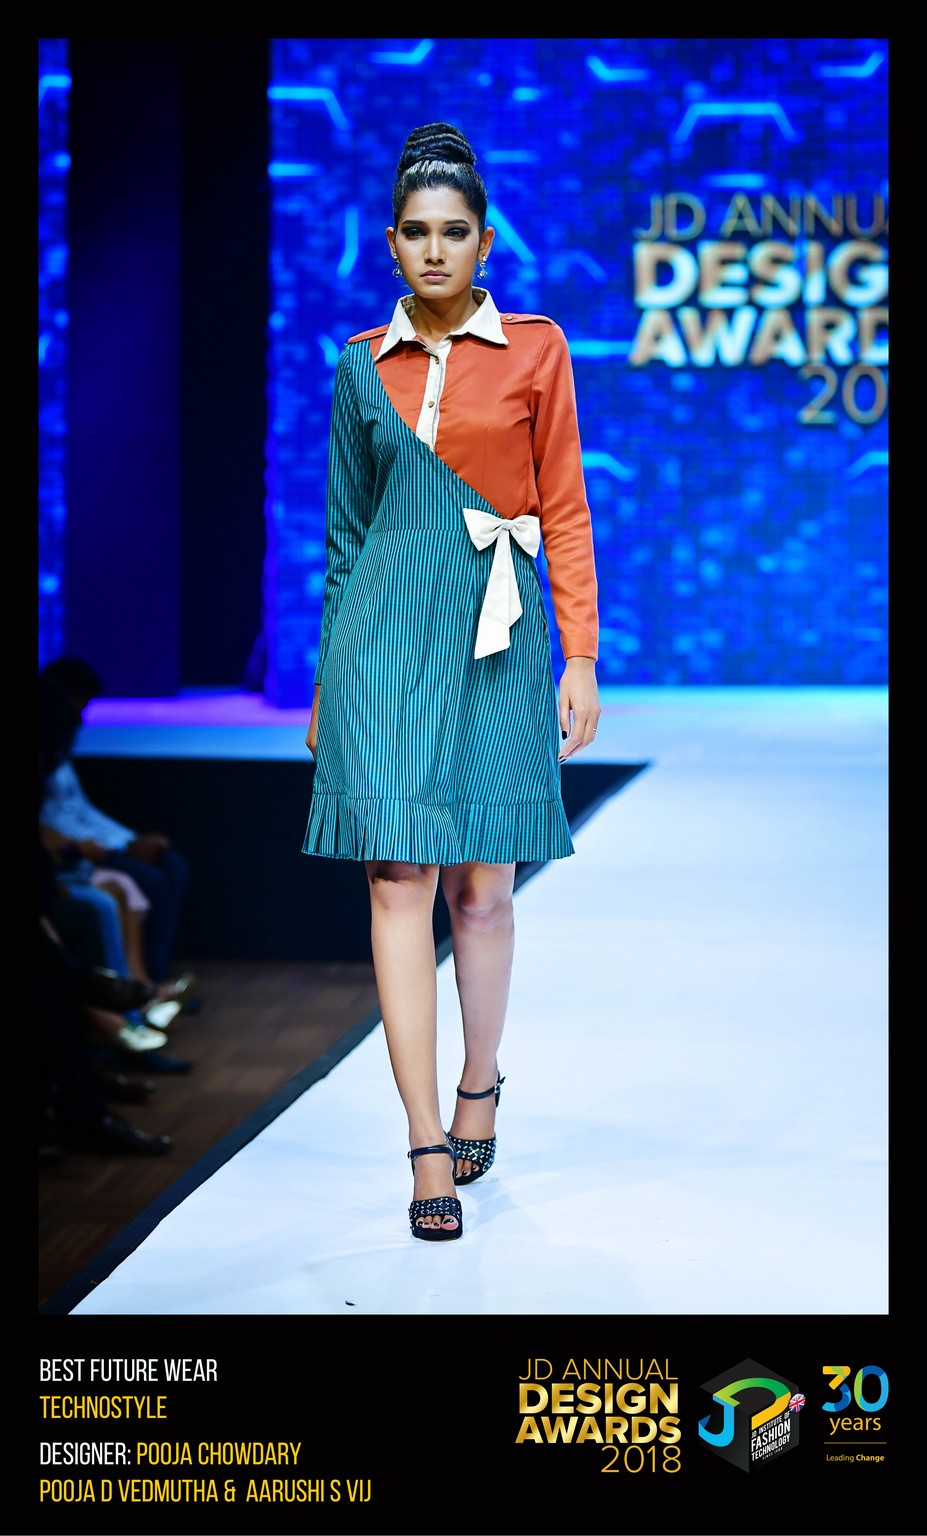 Techno style – Change – JD Annual Design Awards 2018 | Designer: M. Pooja, Pooja.D | Photography : Jerin Nath (@jerin_nath) techno style - Technostyle5 - Techno style – Change – JD Annual Design Awards 2018